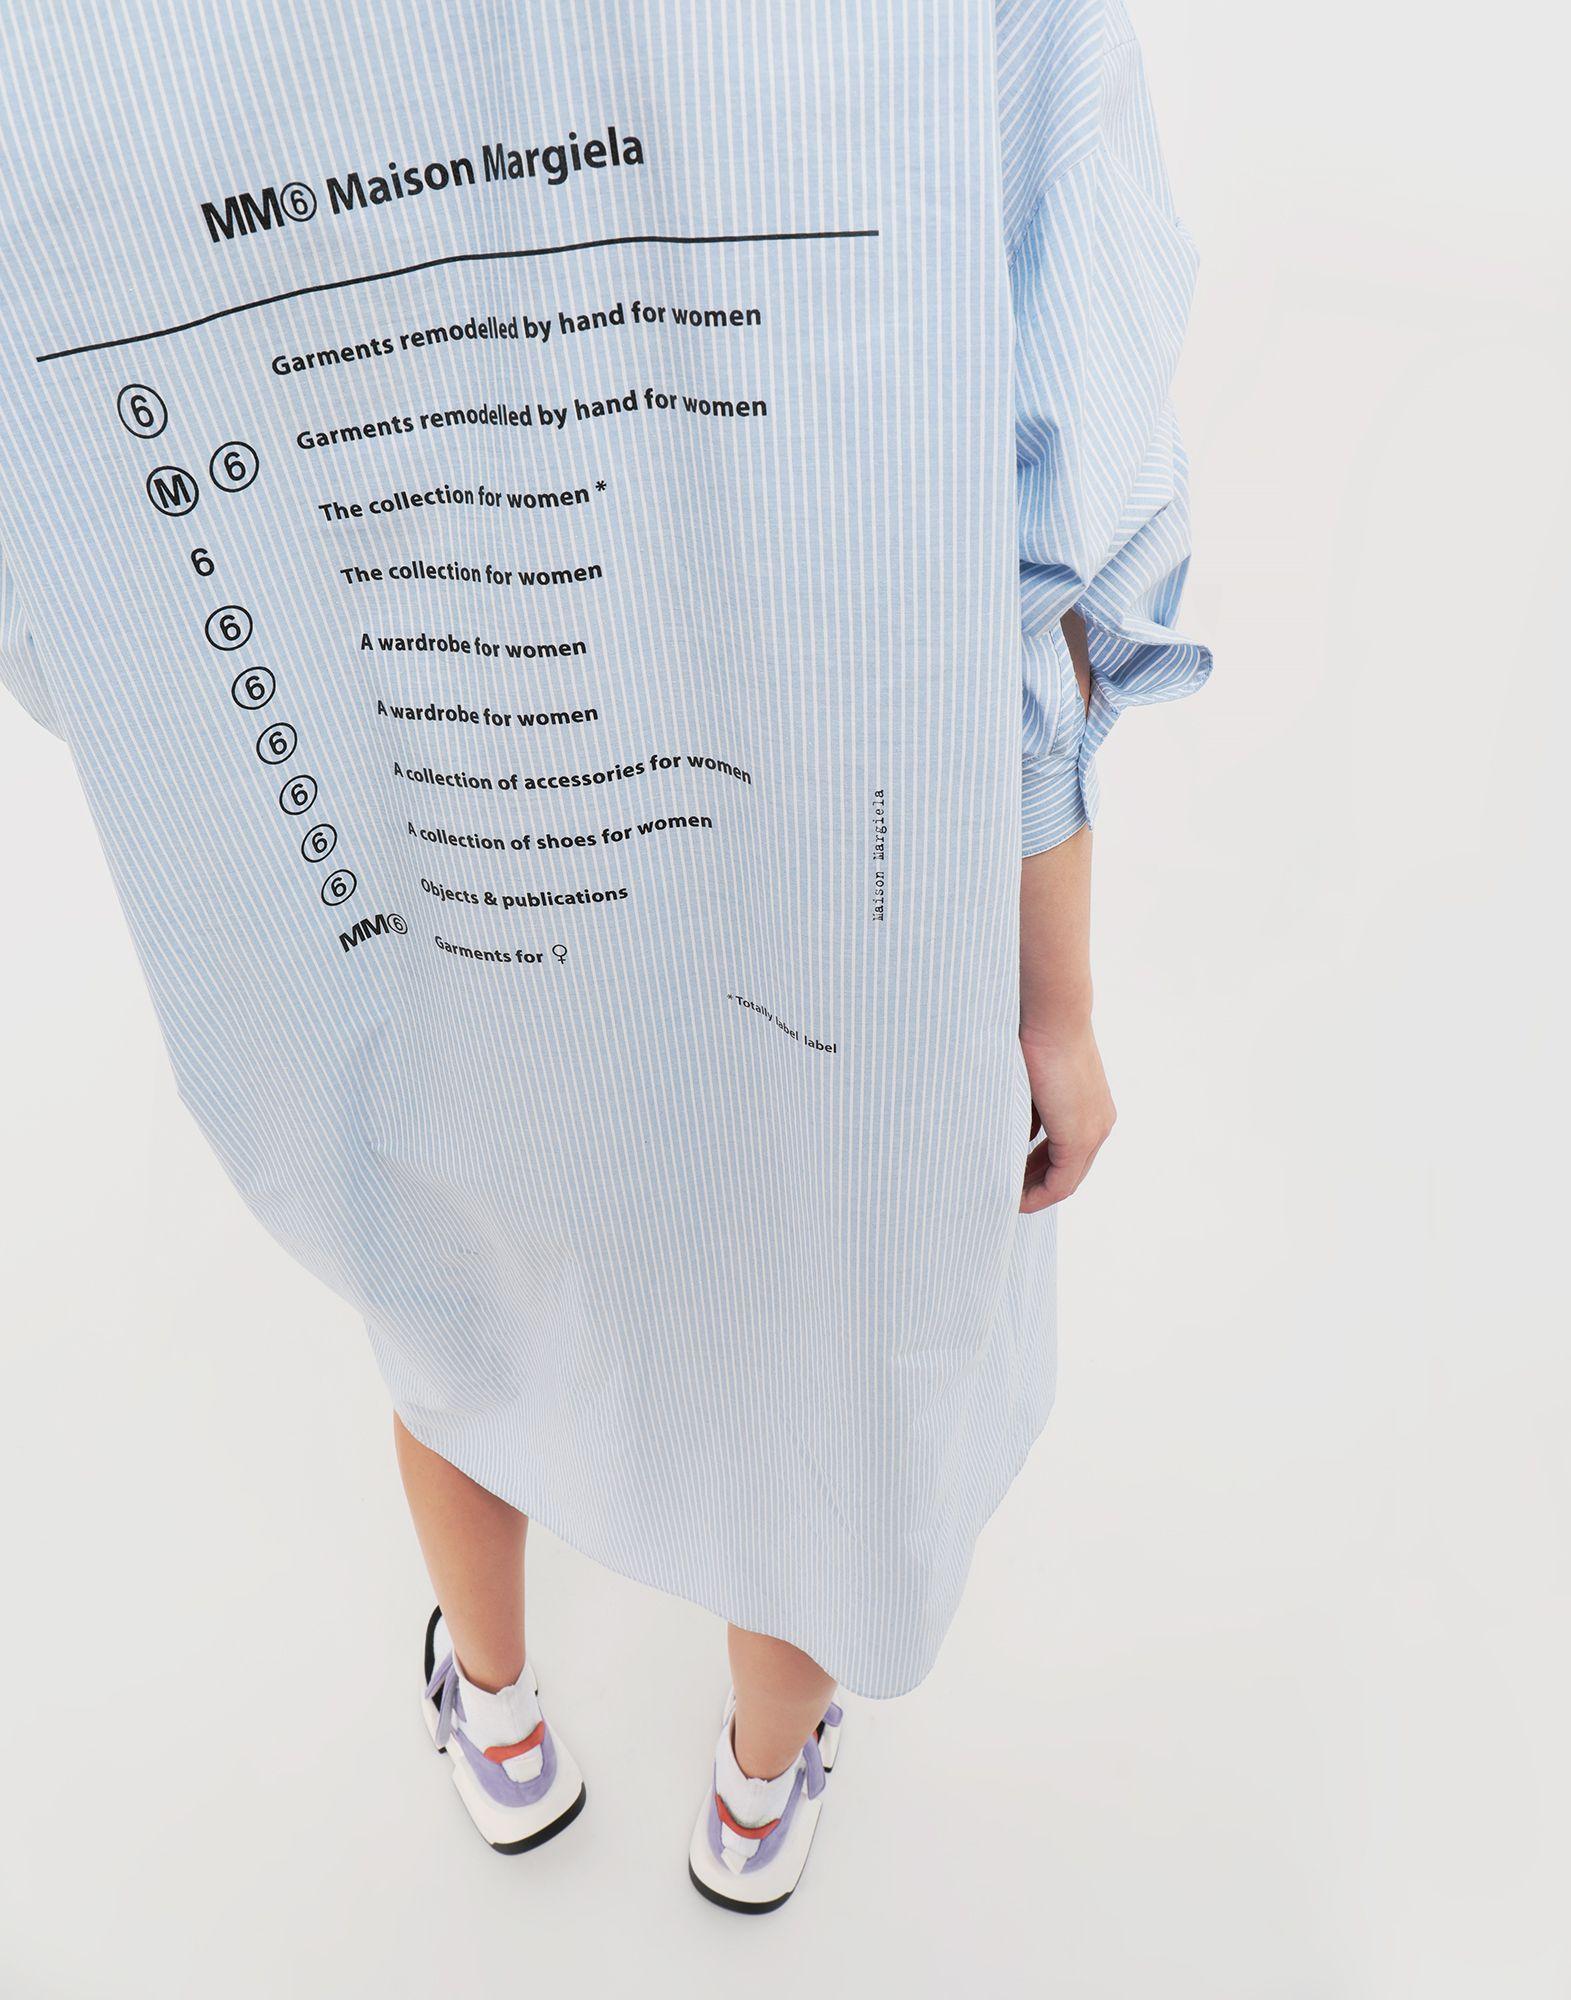 MM6 MAISON MARGIELA Robe chemise en popeline avec imprimé logo Robe mi-longue Femme a